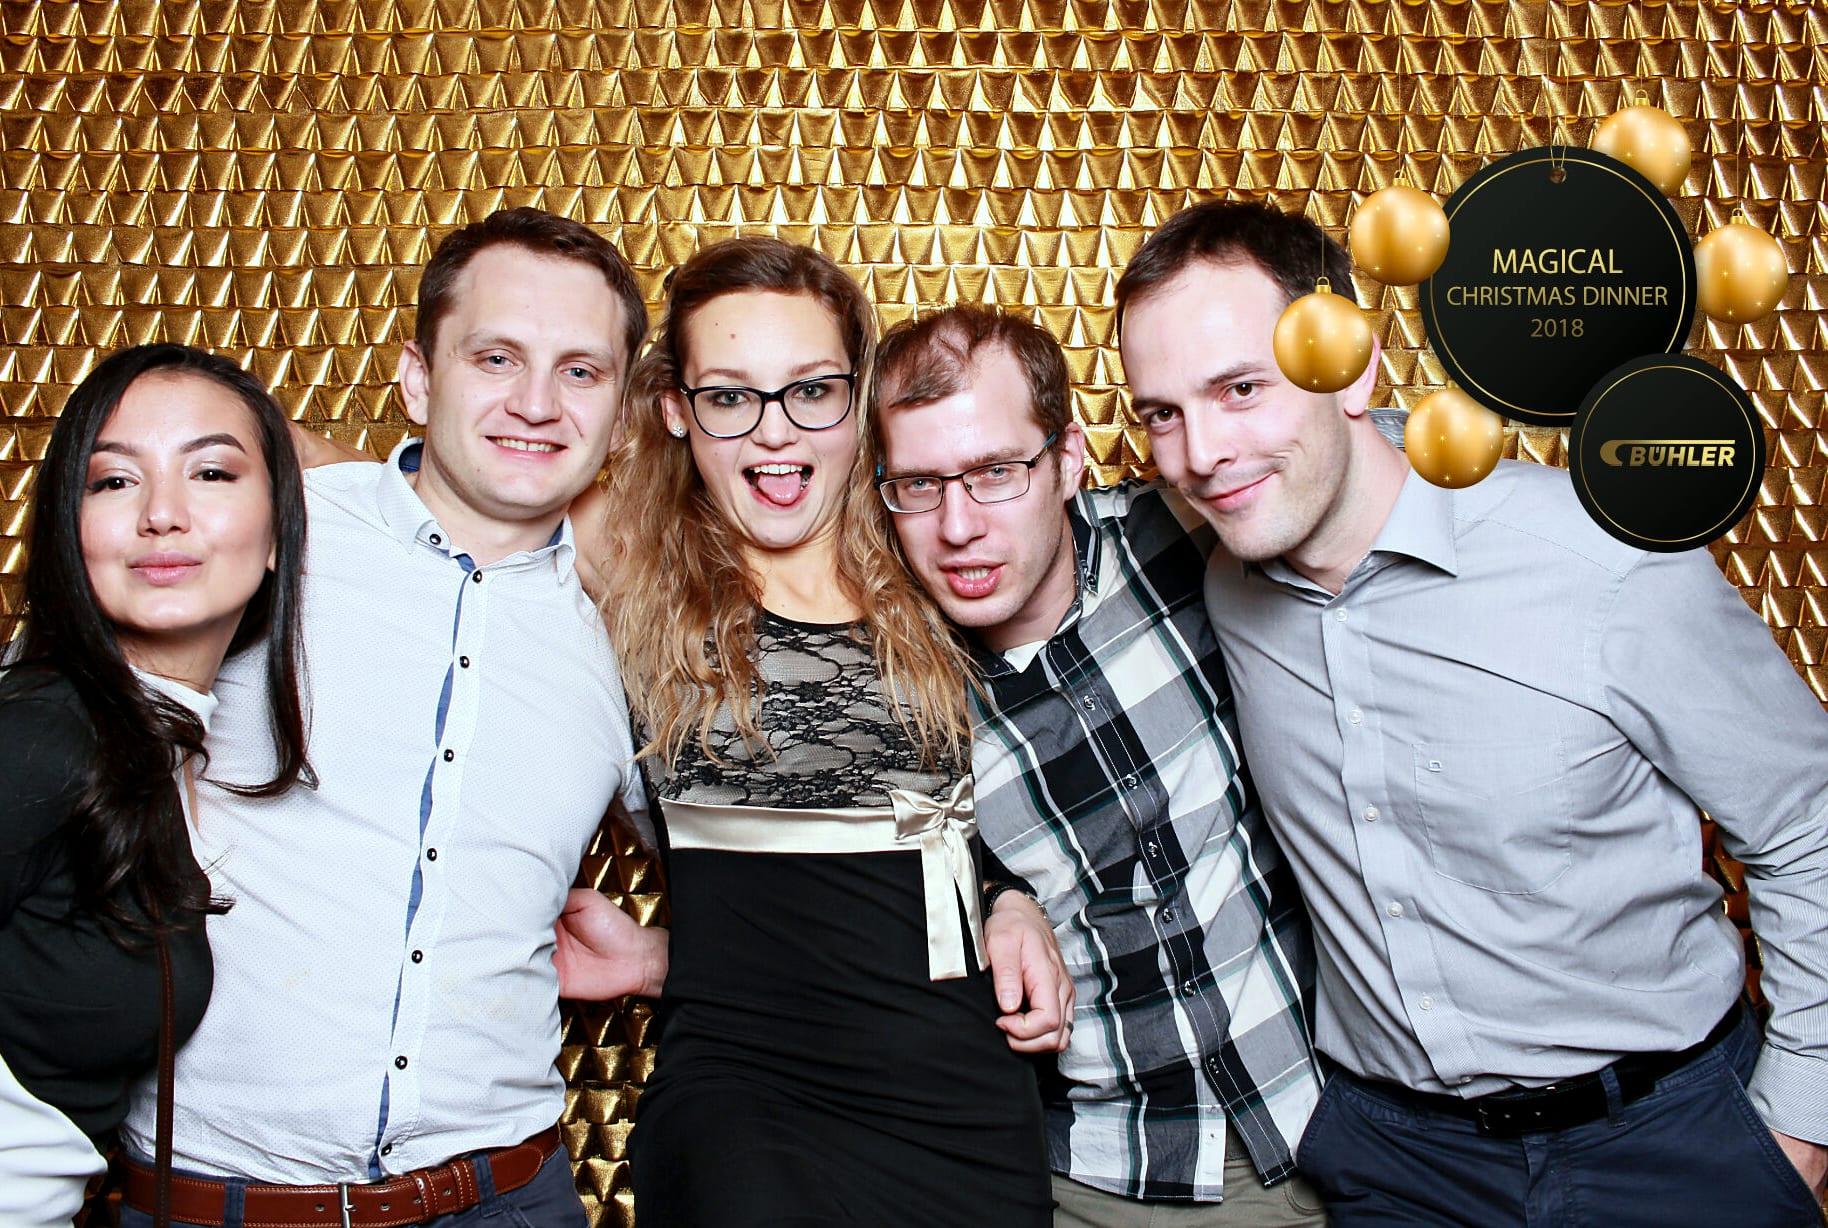 fotokoutek-buhler-14-12-2018-552882